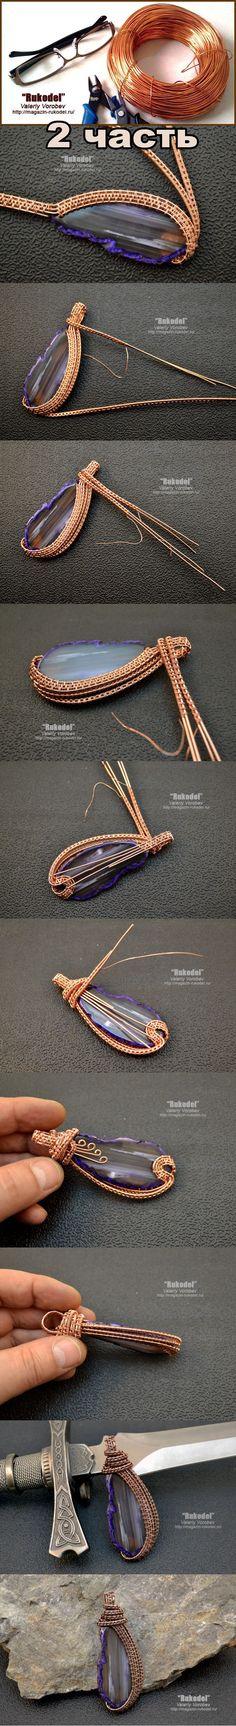 Wire Wrap Pendant - http://magazin-rukodel.ru/?p=4419